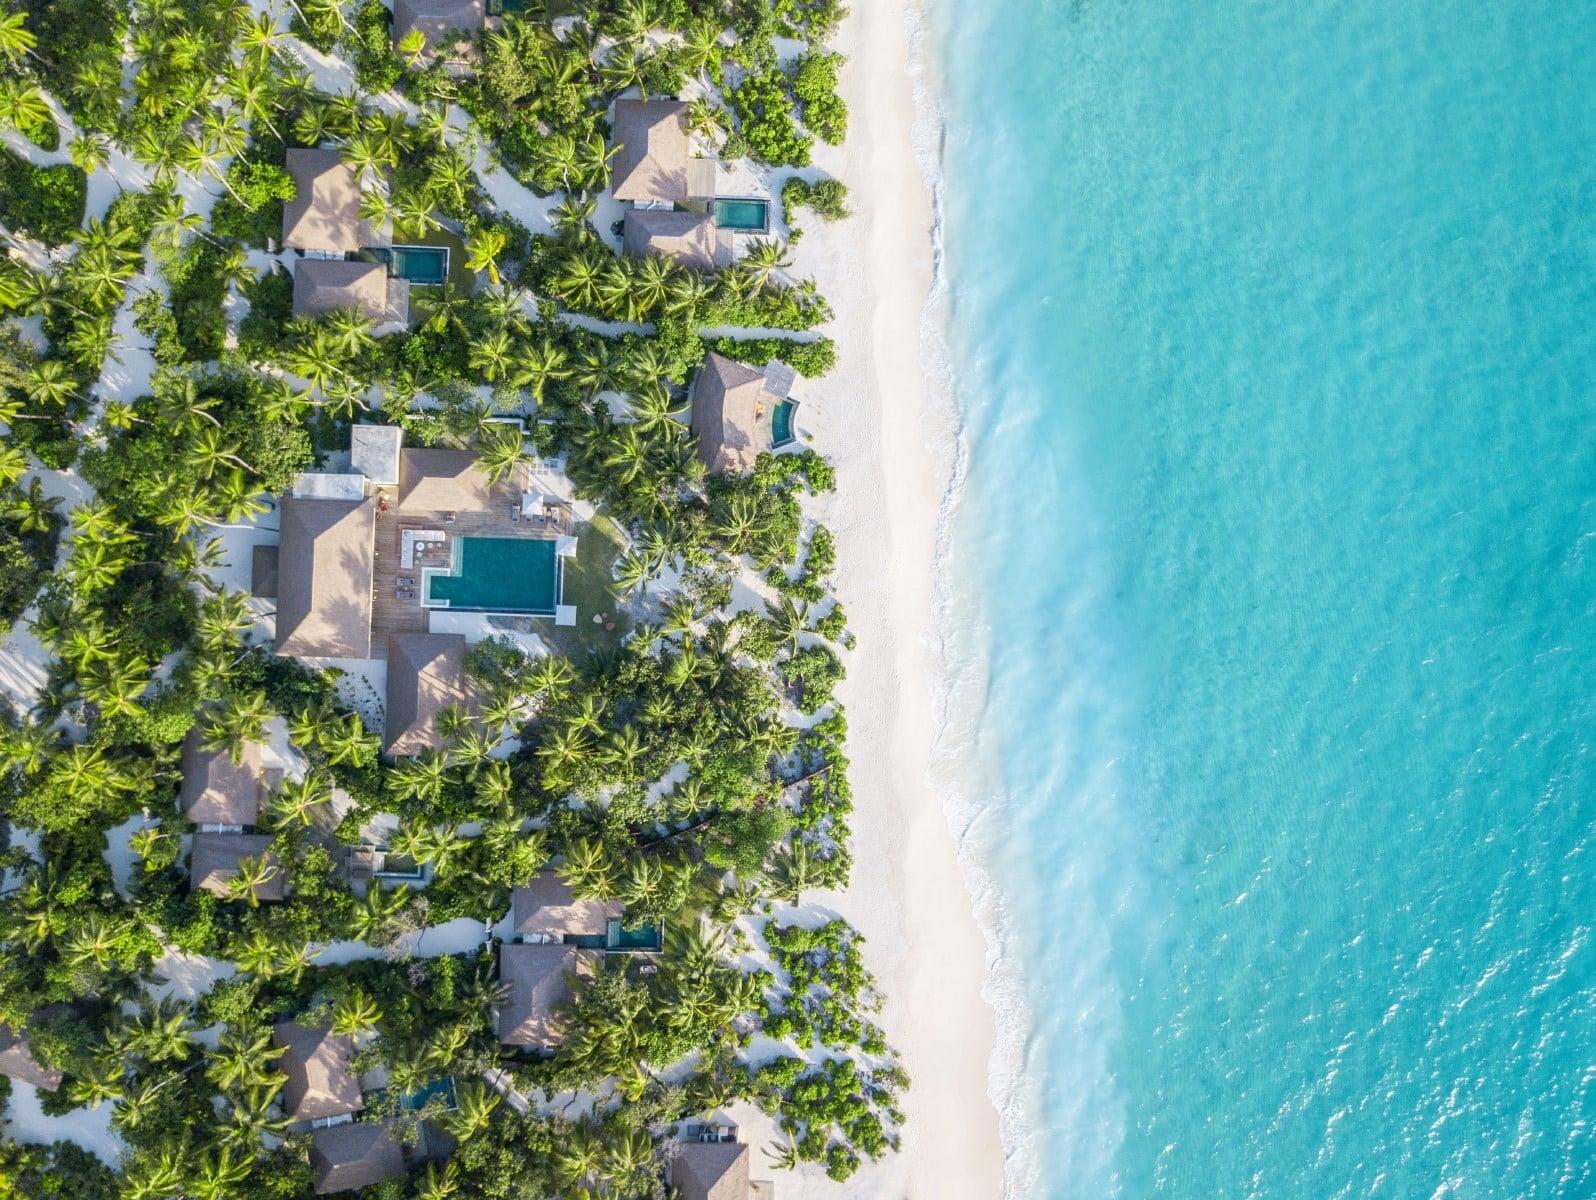 Мальдивы, отель Intercontinental Maldives Maamunagau, номер Three Bedroom Royal Beachfront Residence